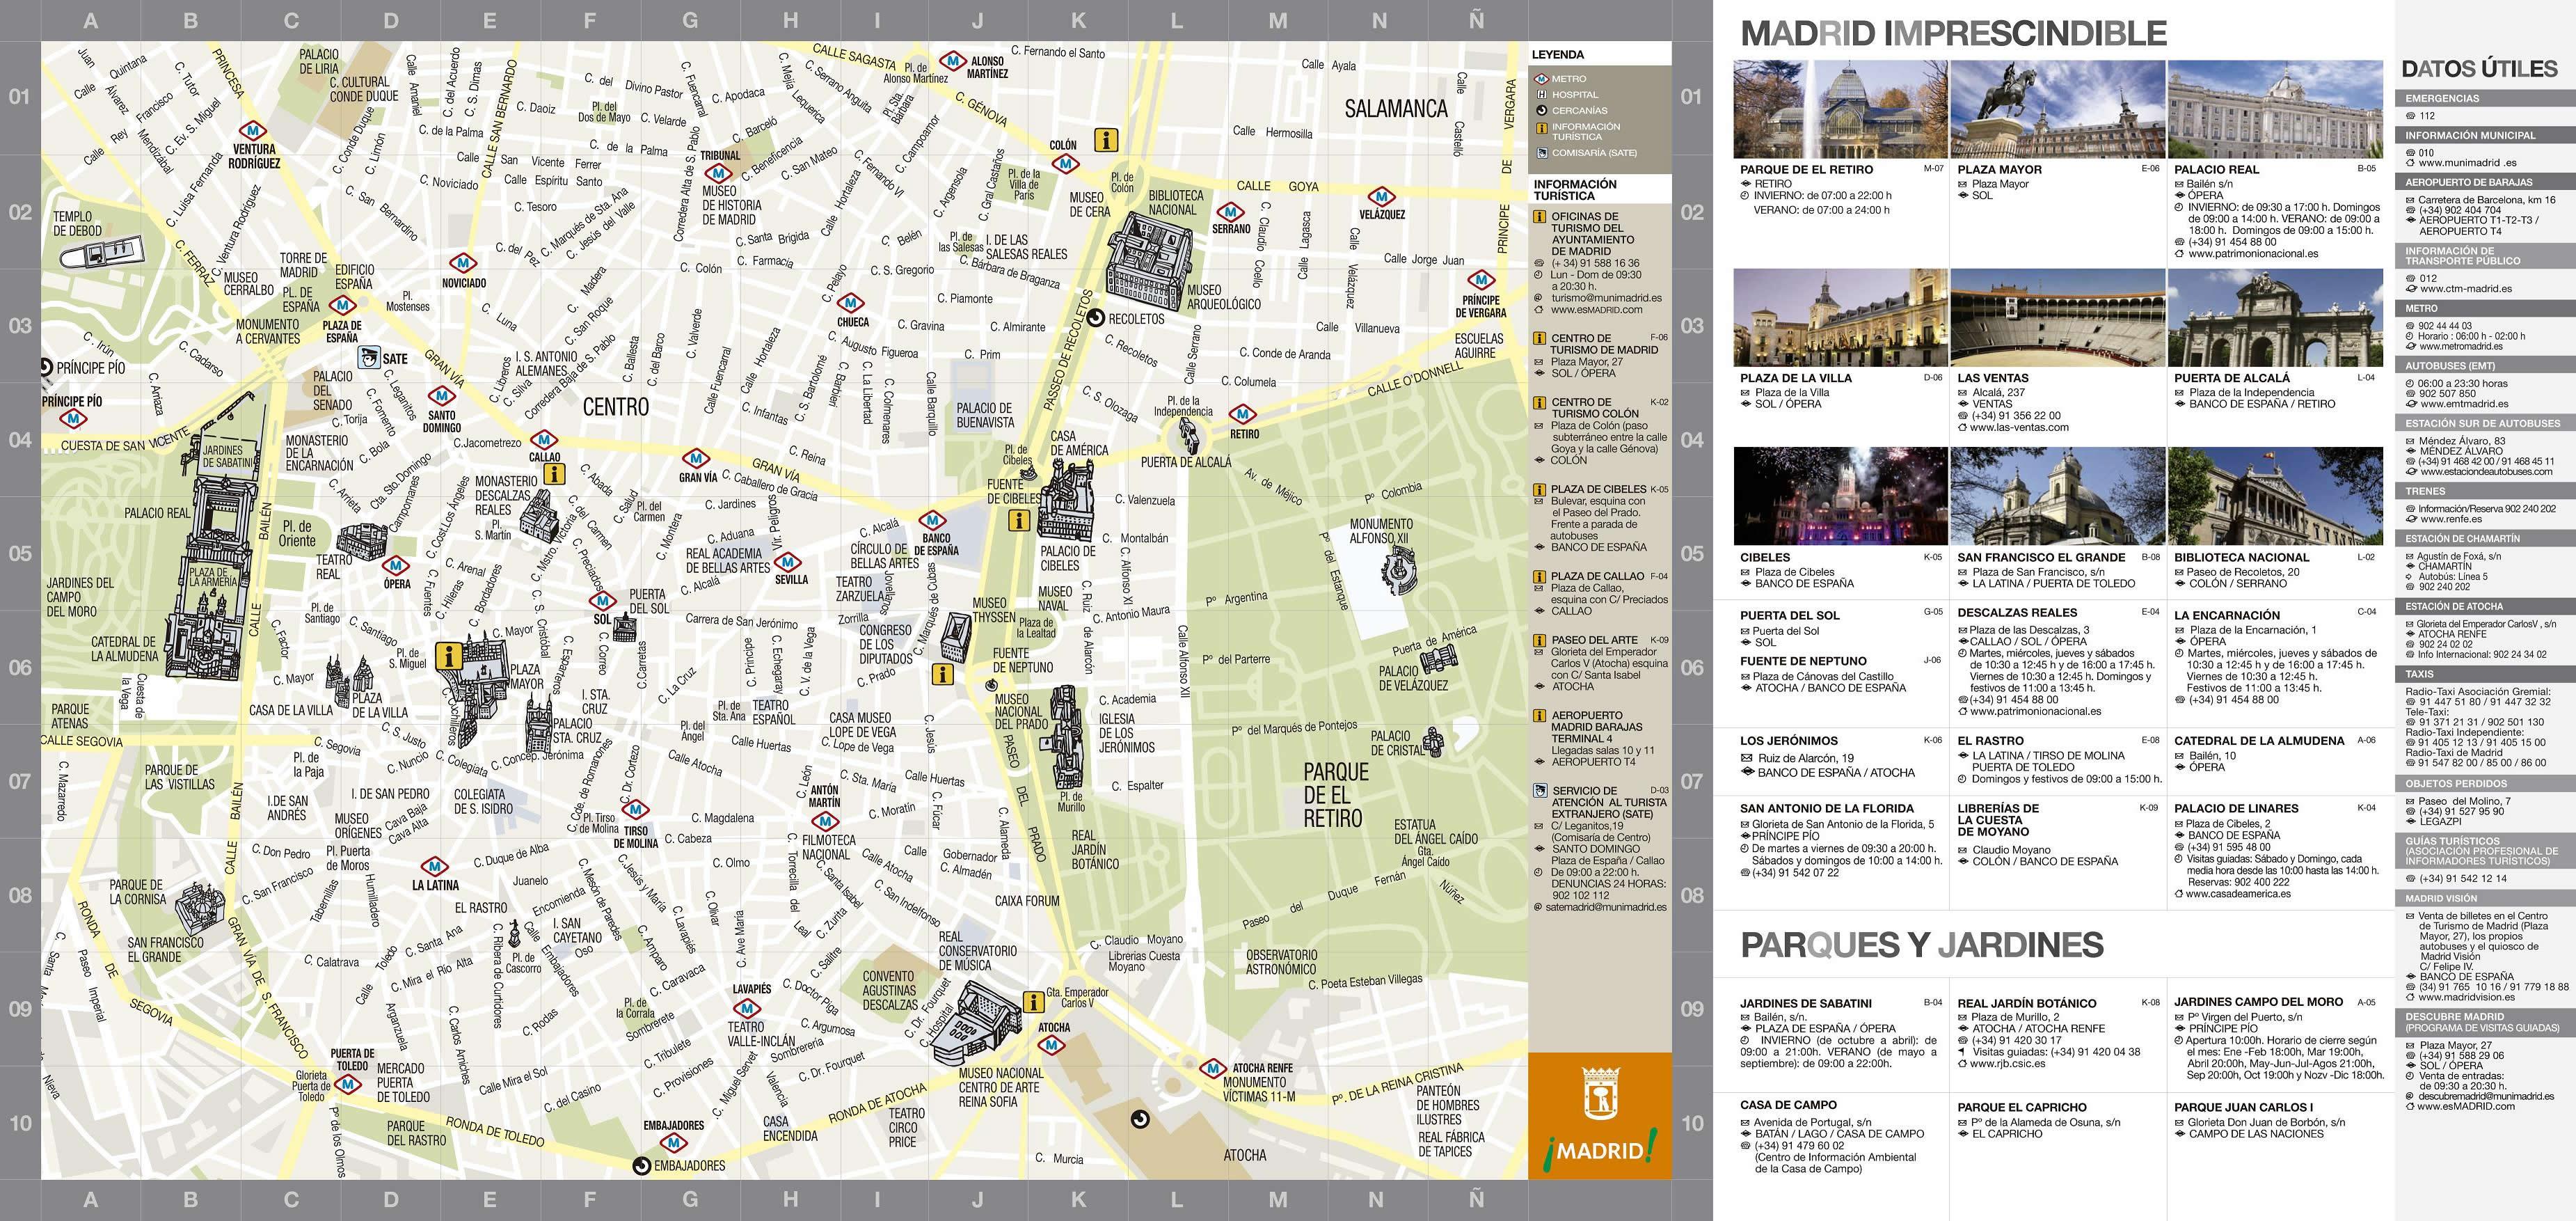 Mapa Turistico De Madrid.Mapa Turistico De Madrid 2009 Mapa Owje Com